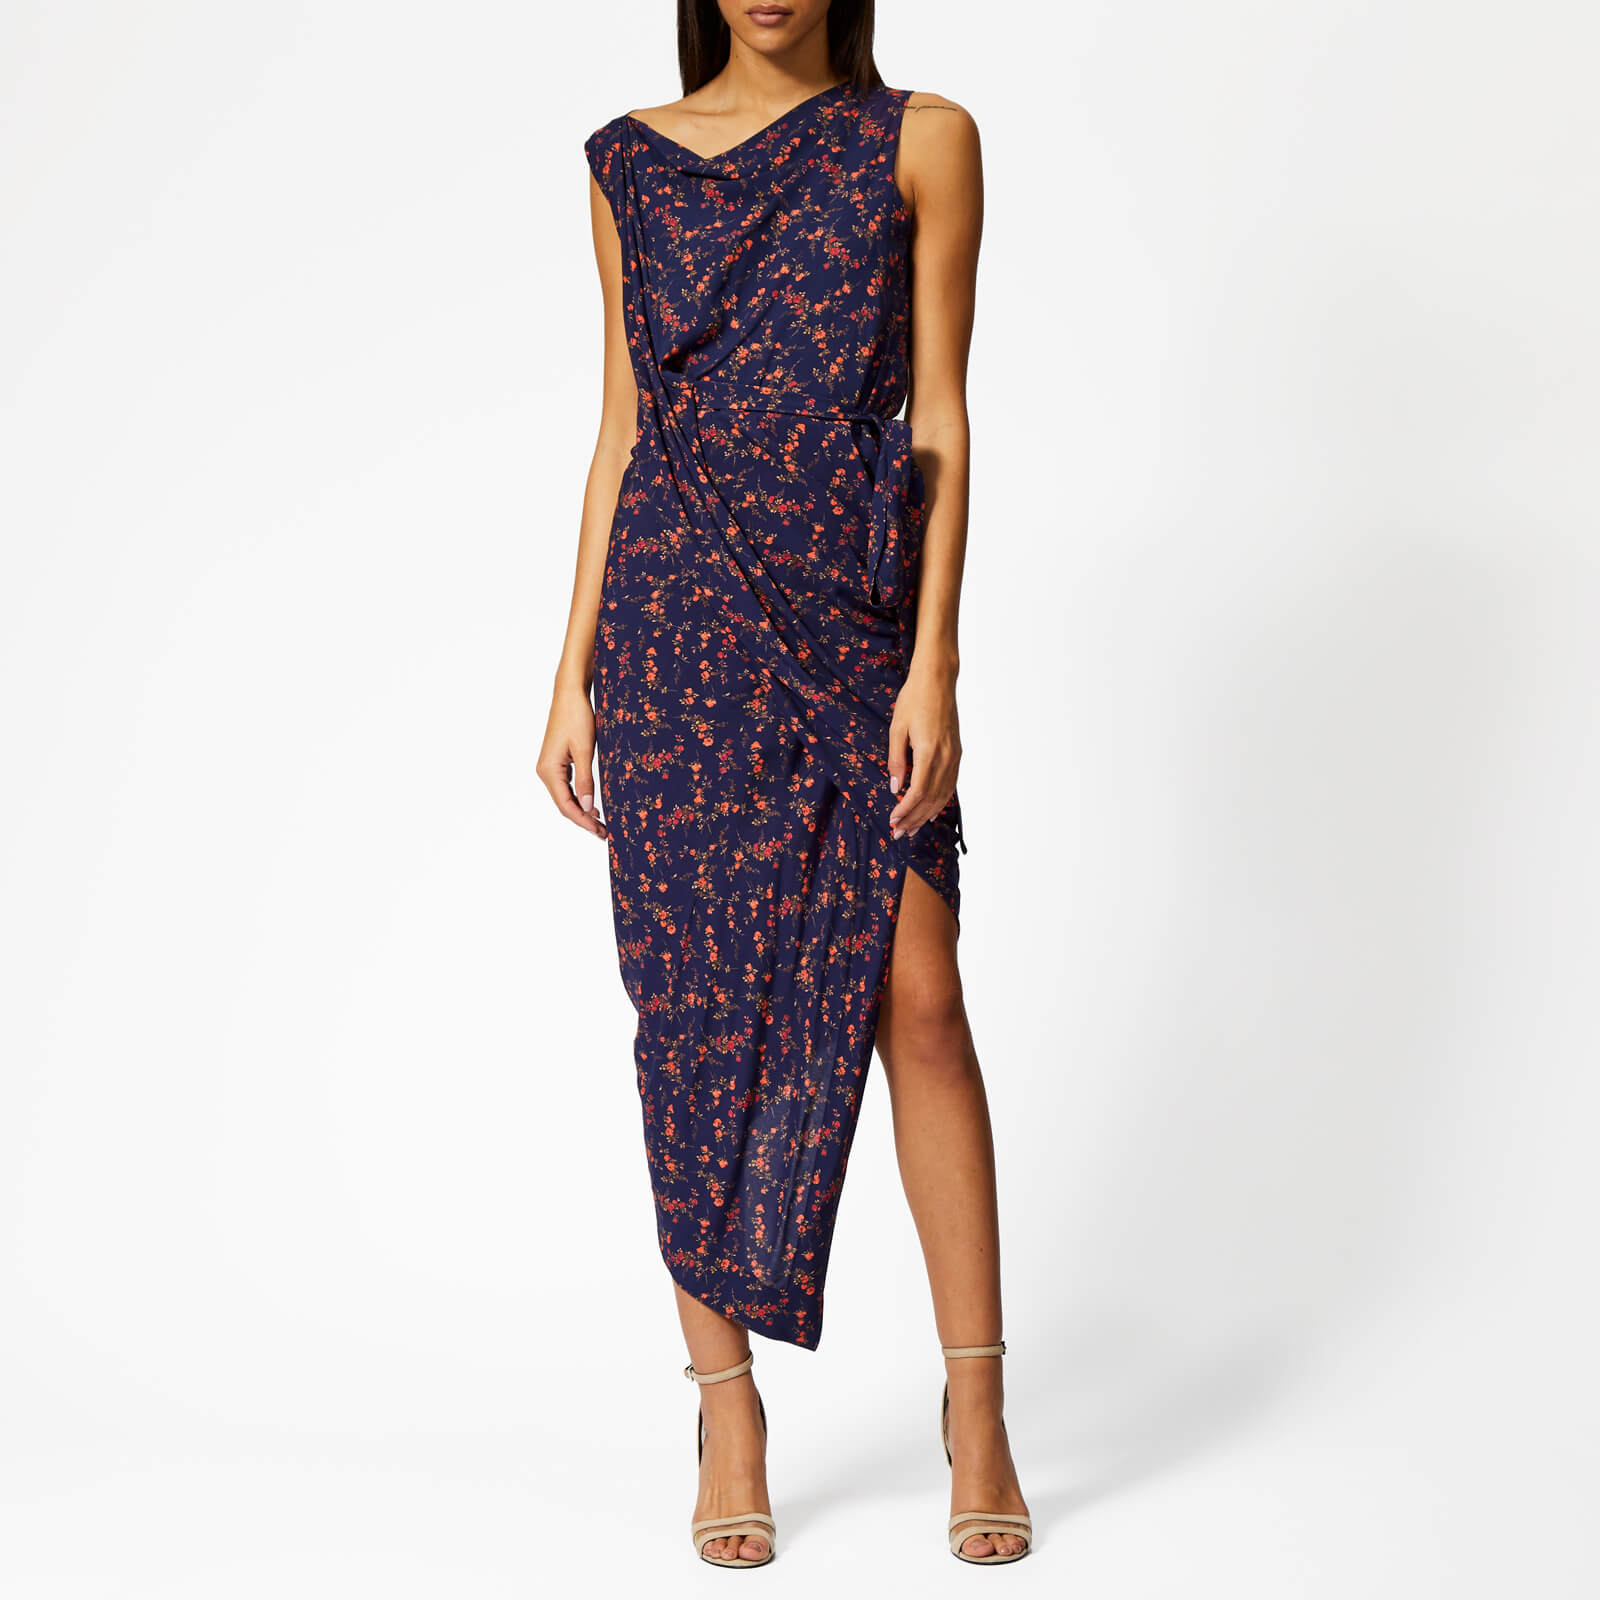 Vivienne Westwood Anglomania Women s Vian Dress - Multi - Free UK Delivery  over £50 4c69eeaf6